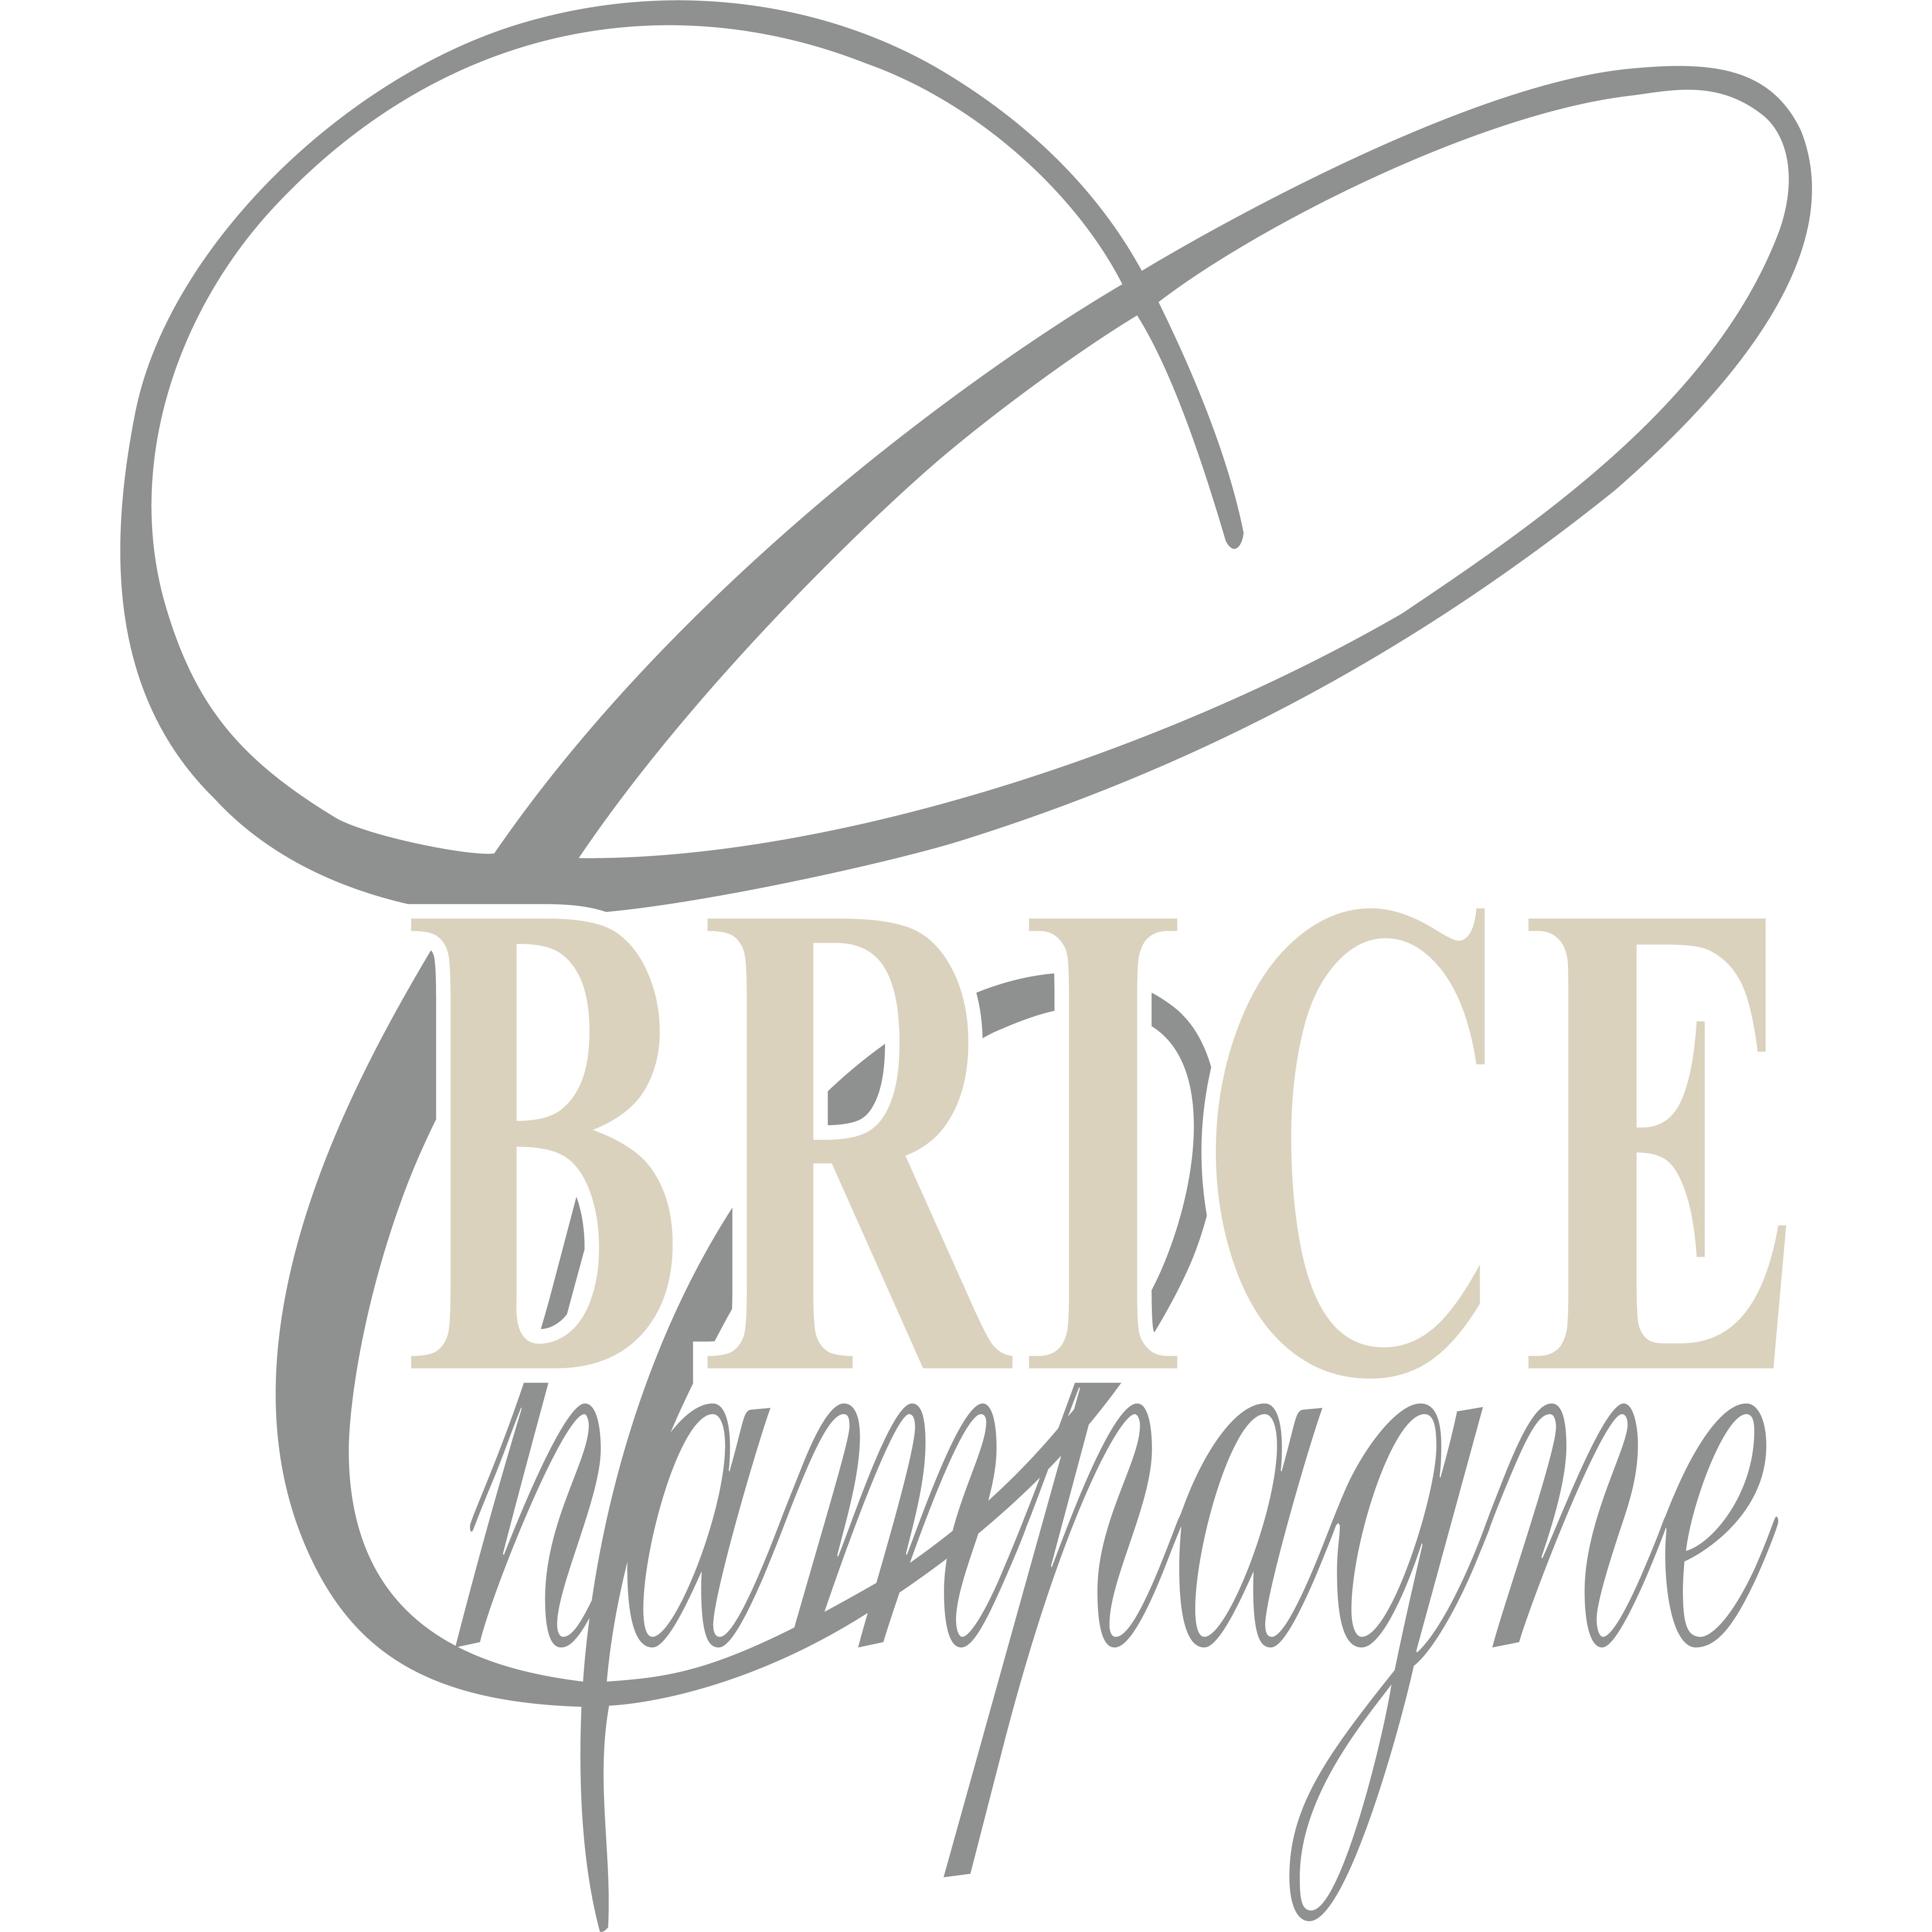 Brice-Champagner